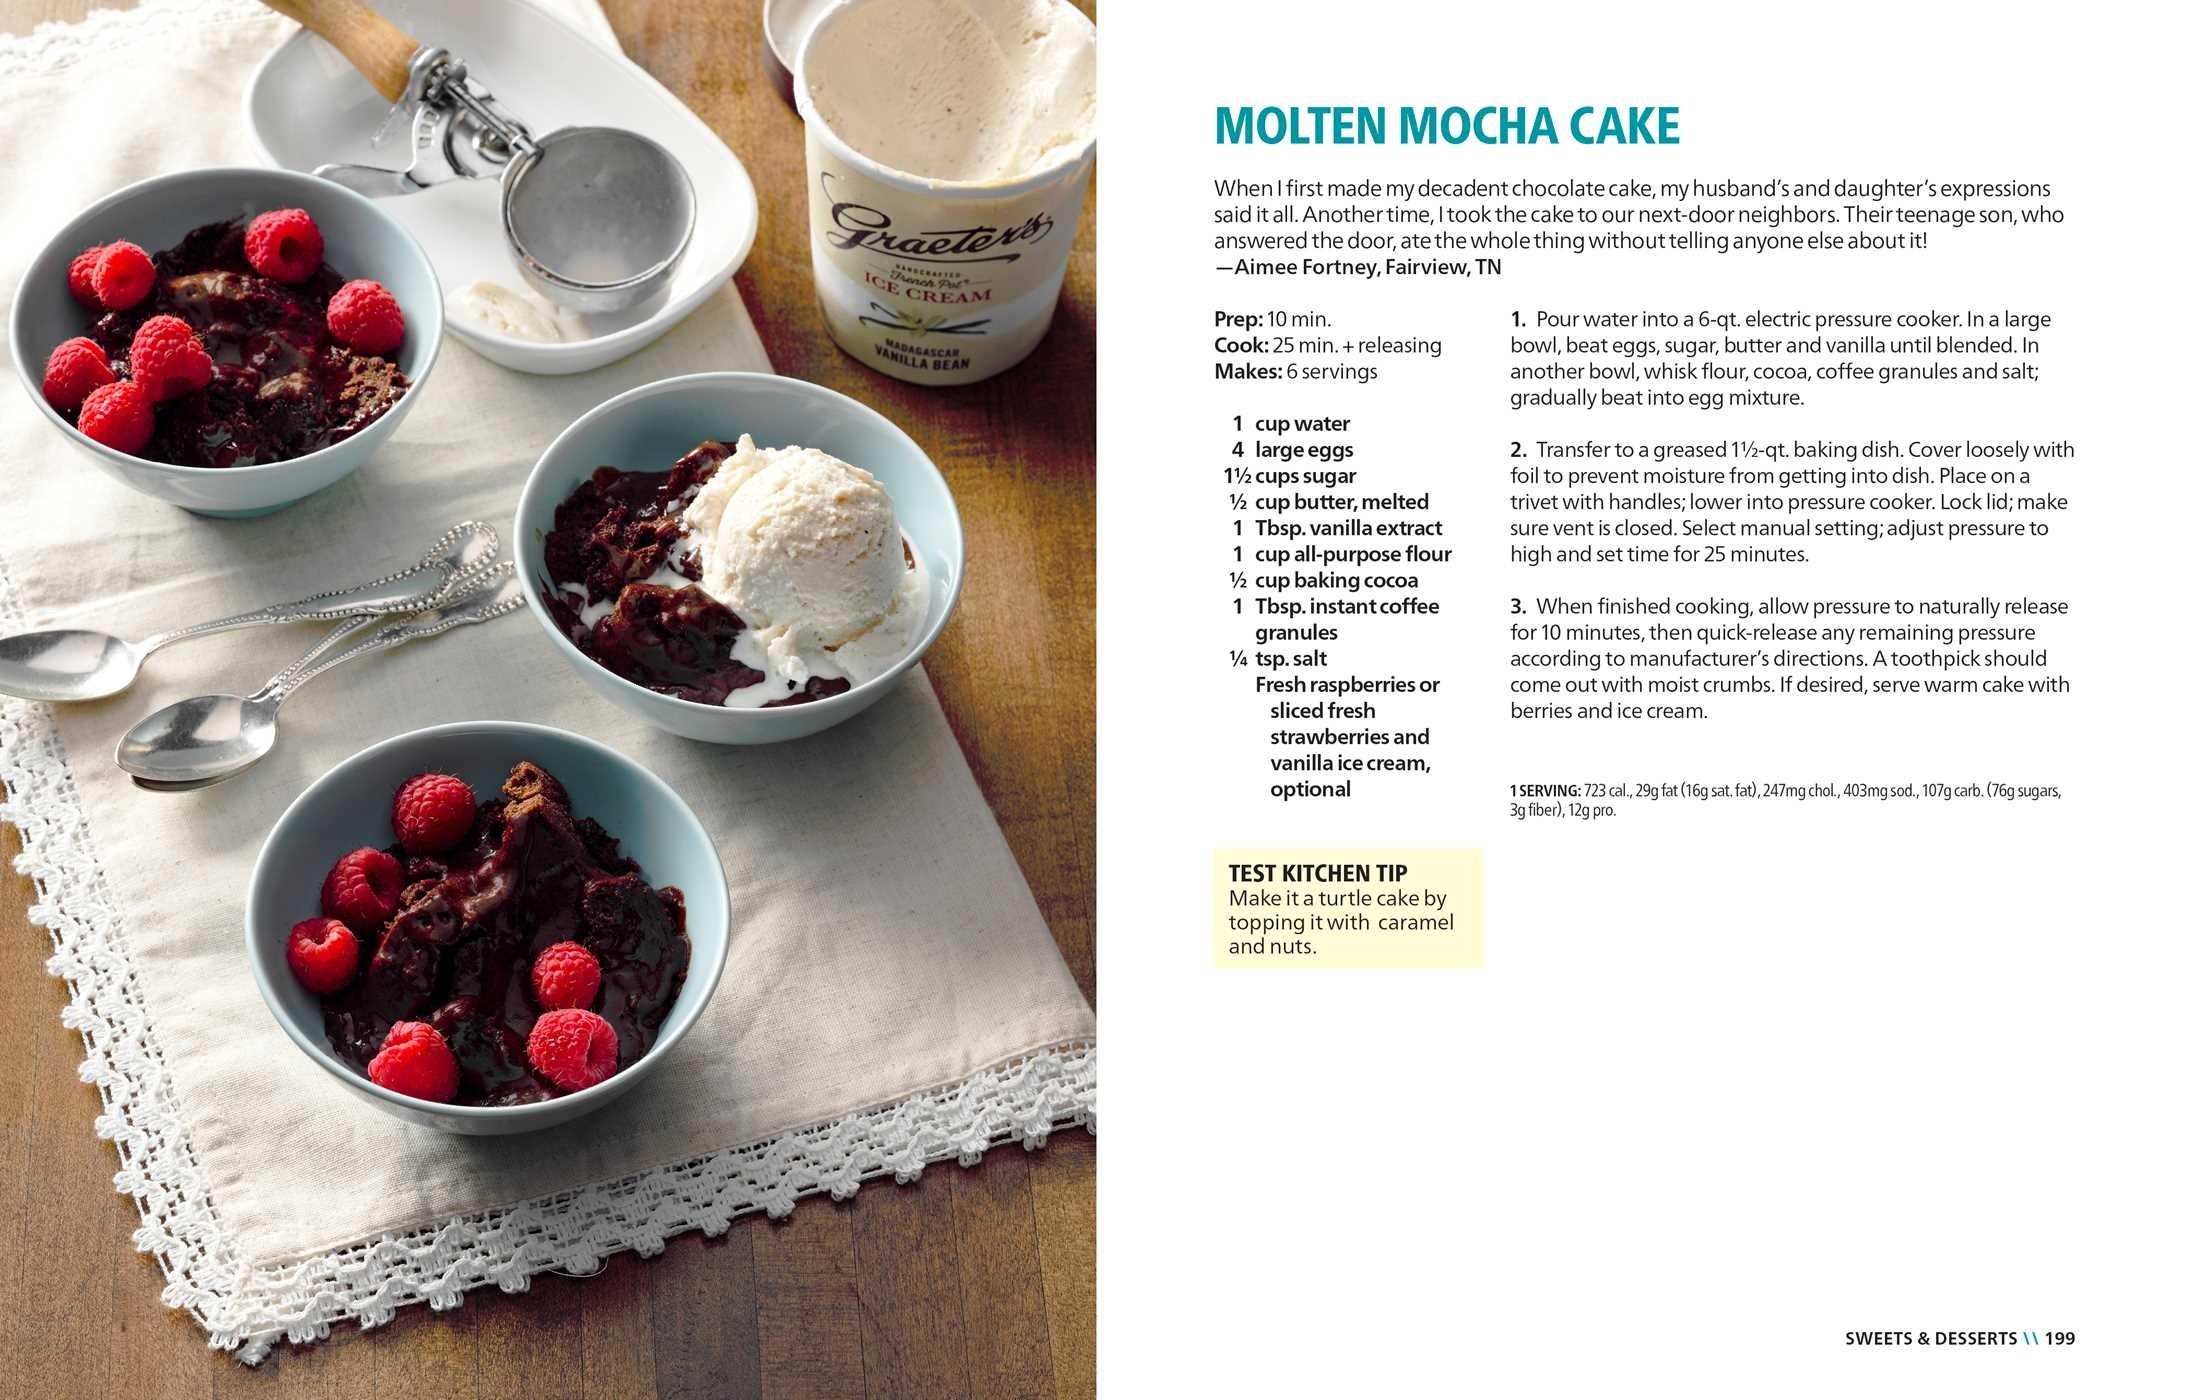 Taste of home instant pot cookbook 9781617657665.in10